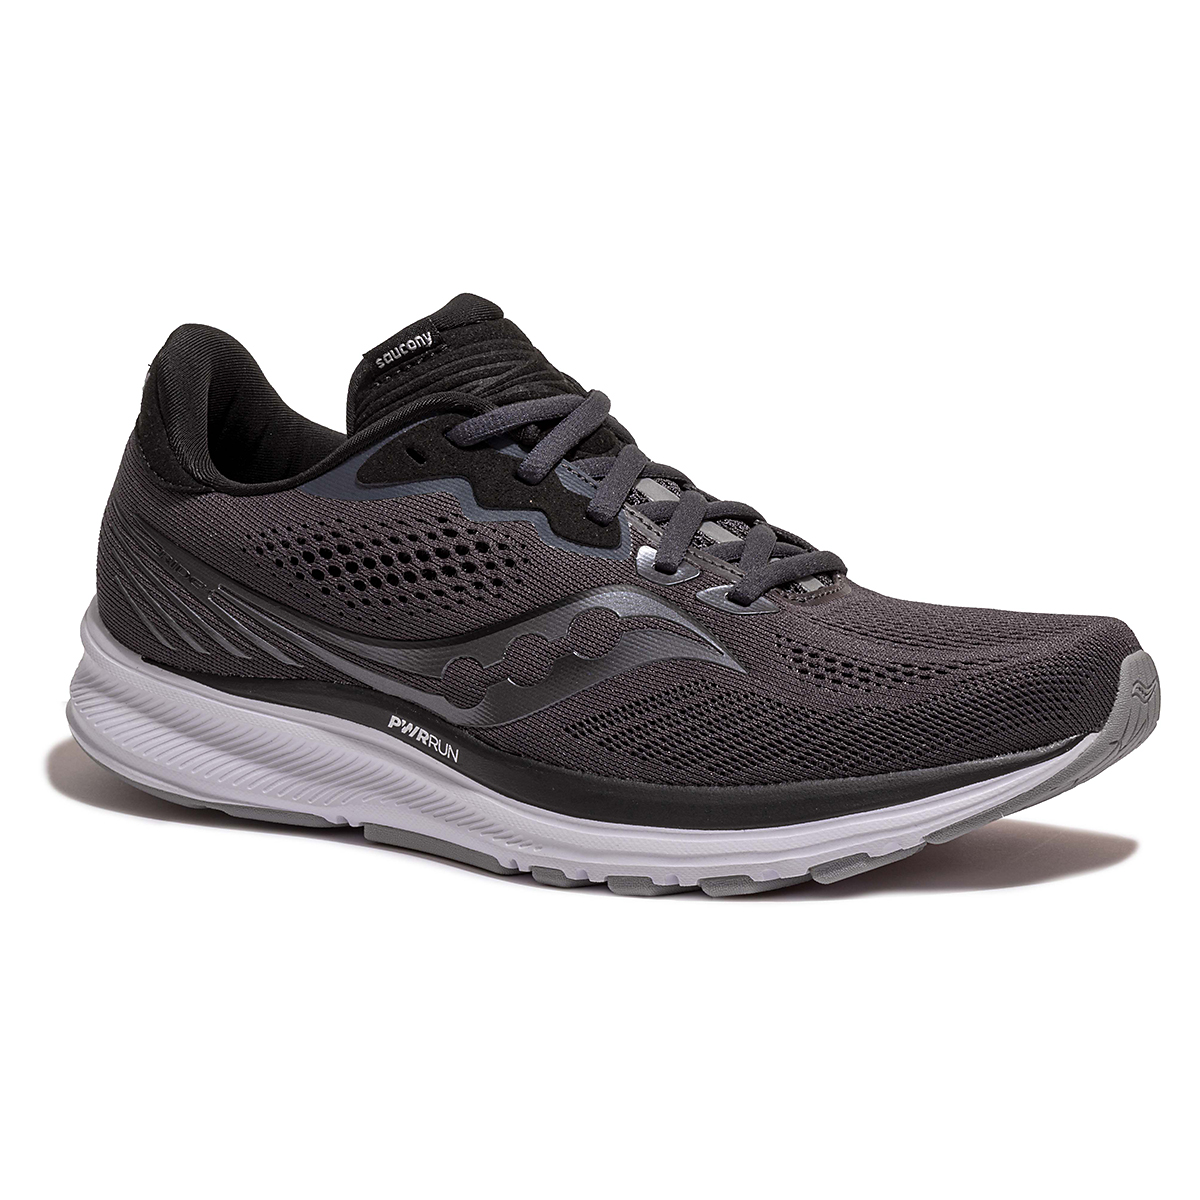 Men's Saucony Ride 14 Running Shoe - Color: Charcoal/Black - Size: 7 - Width: Wide, Charcoal/Black, large, image 5